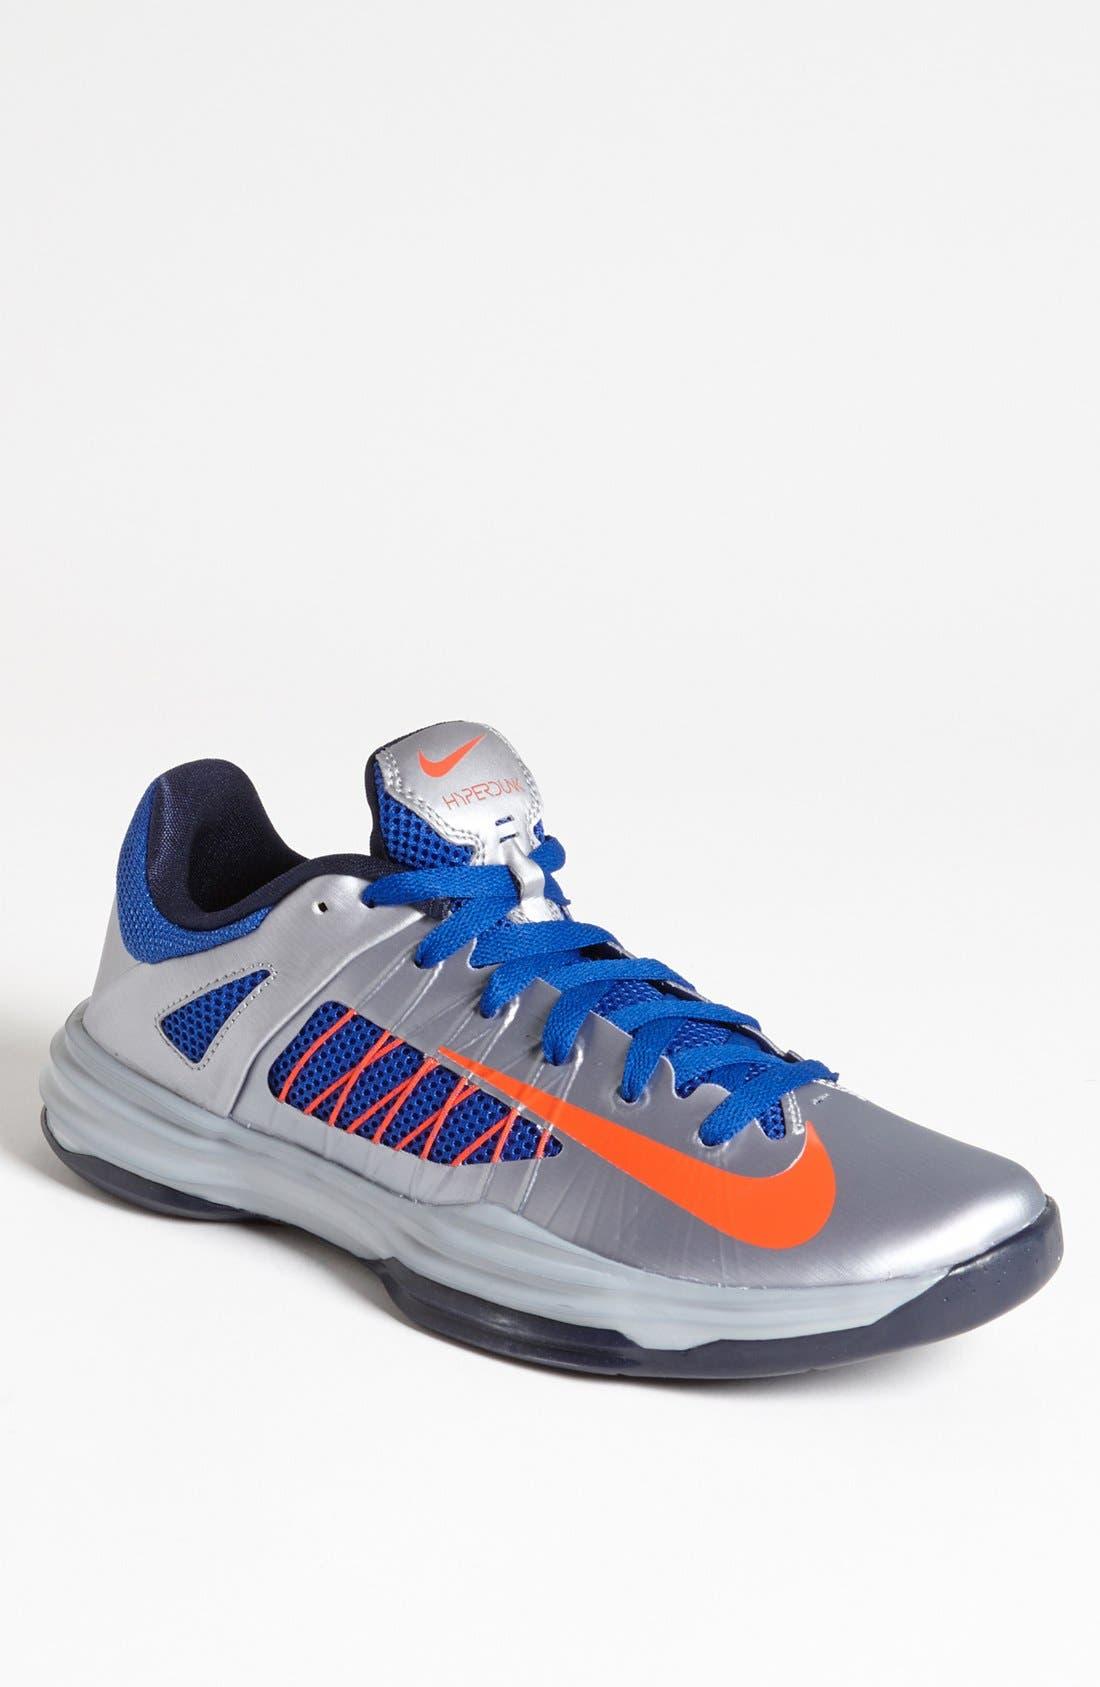 Alternate Image 1 Selected - Nike 'Hyperdunk Low' Basketball Shoe (Men)